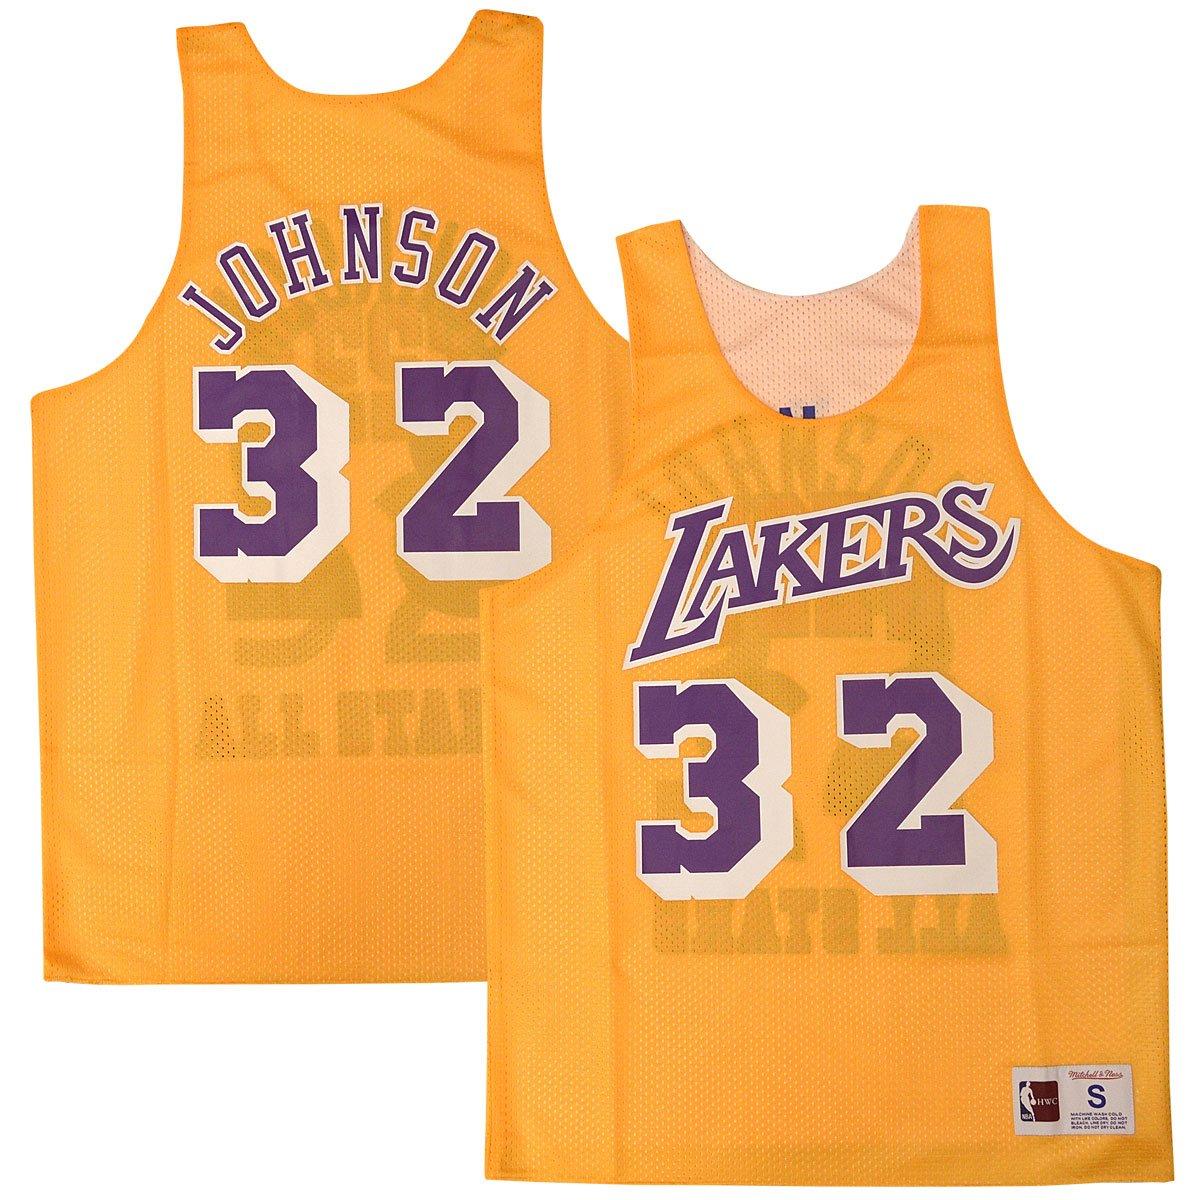 cfed1420b Amazon.com   Magic Johnson Lakers All Star 1983 Reversible Jersey  (XX-Large)   Sports   Outdoors